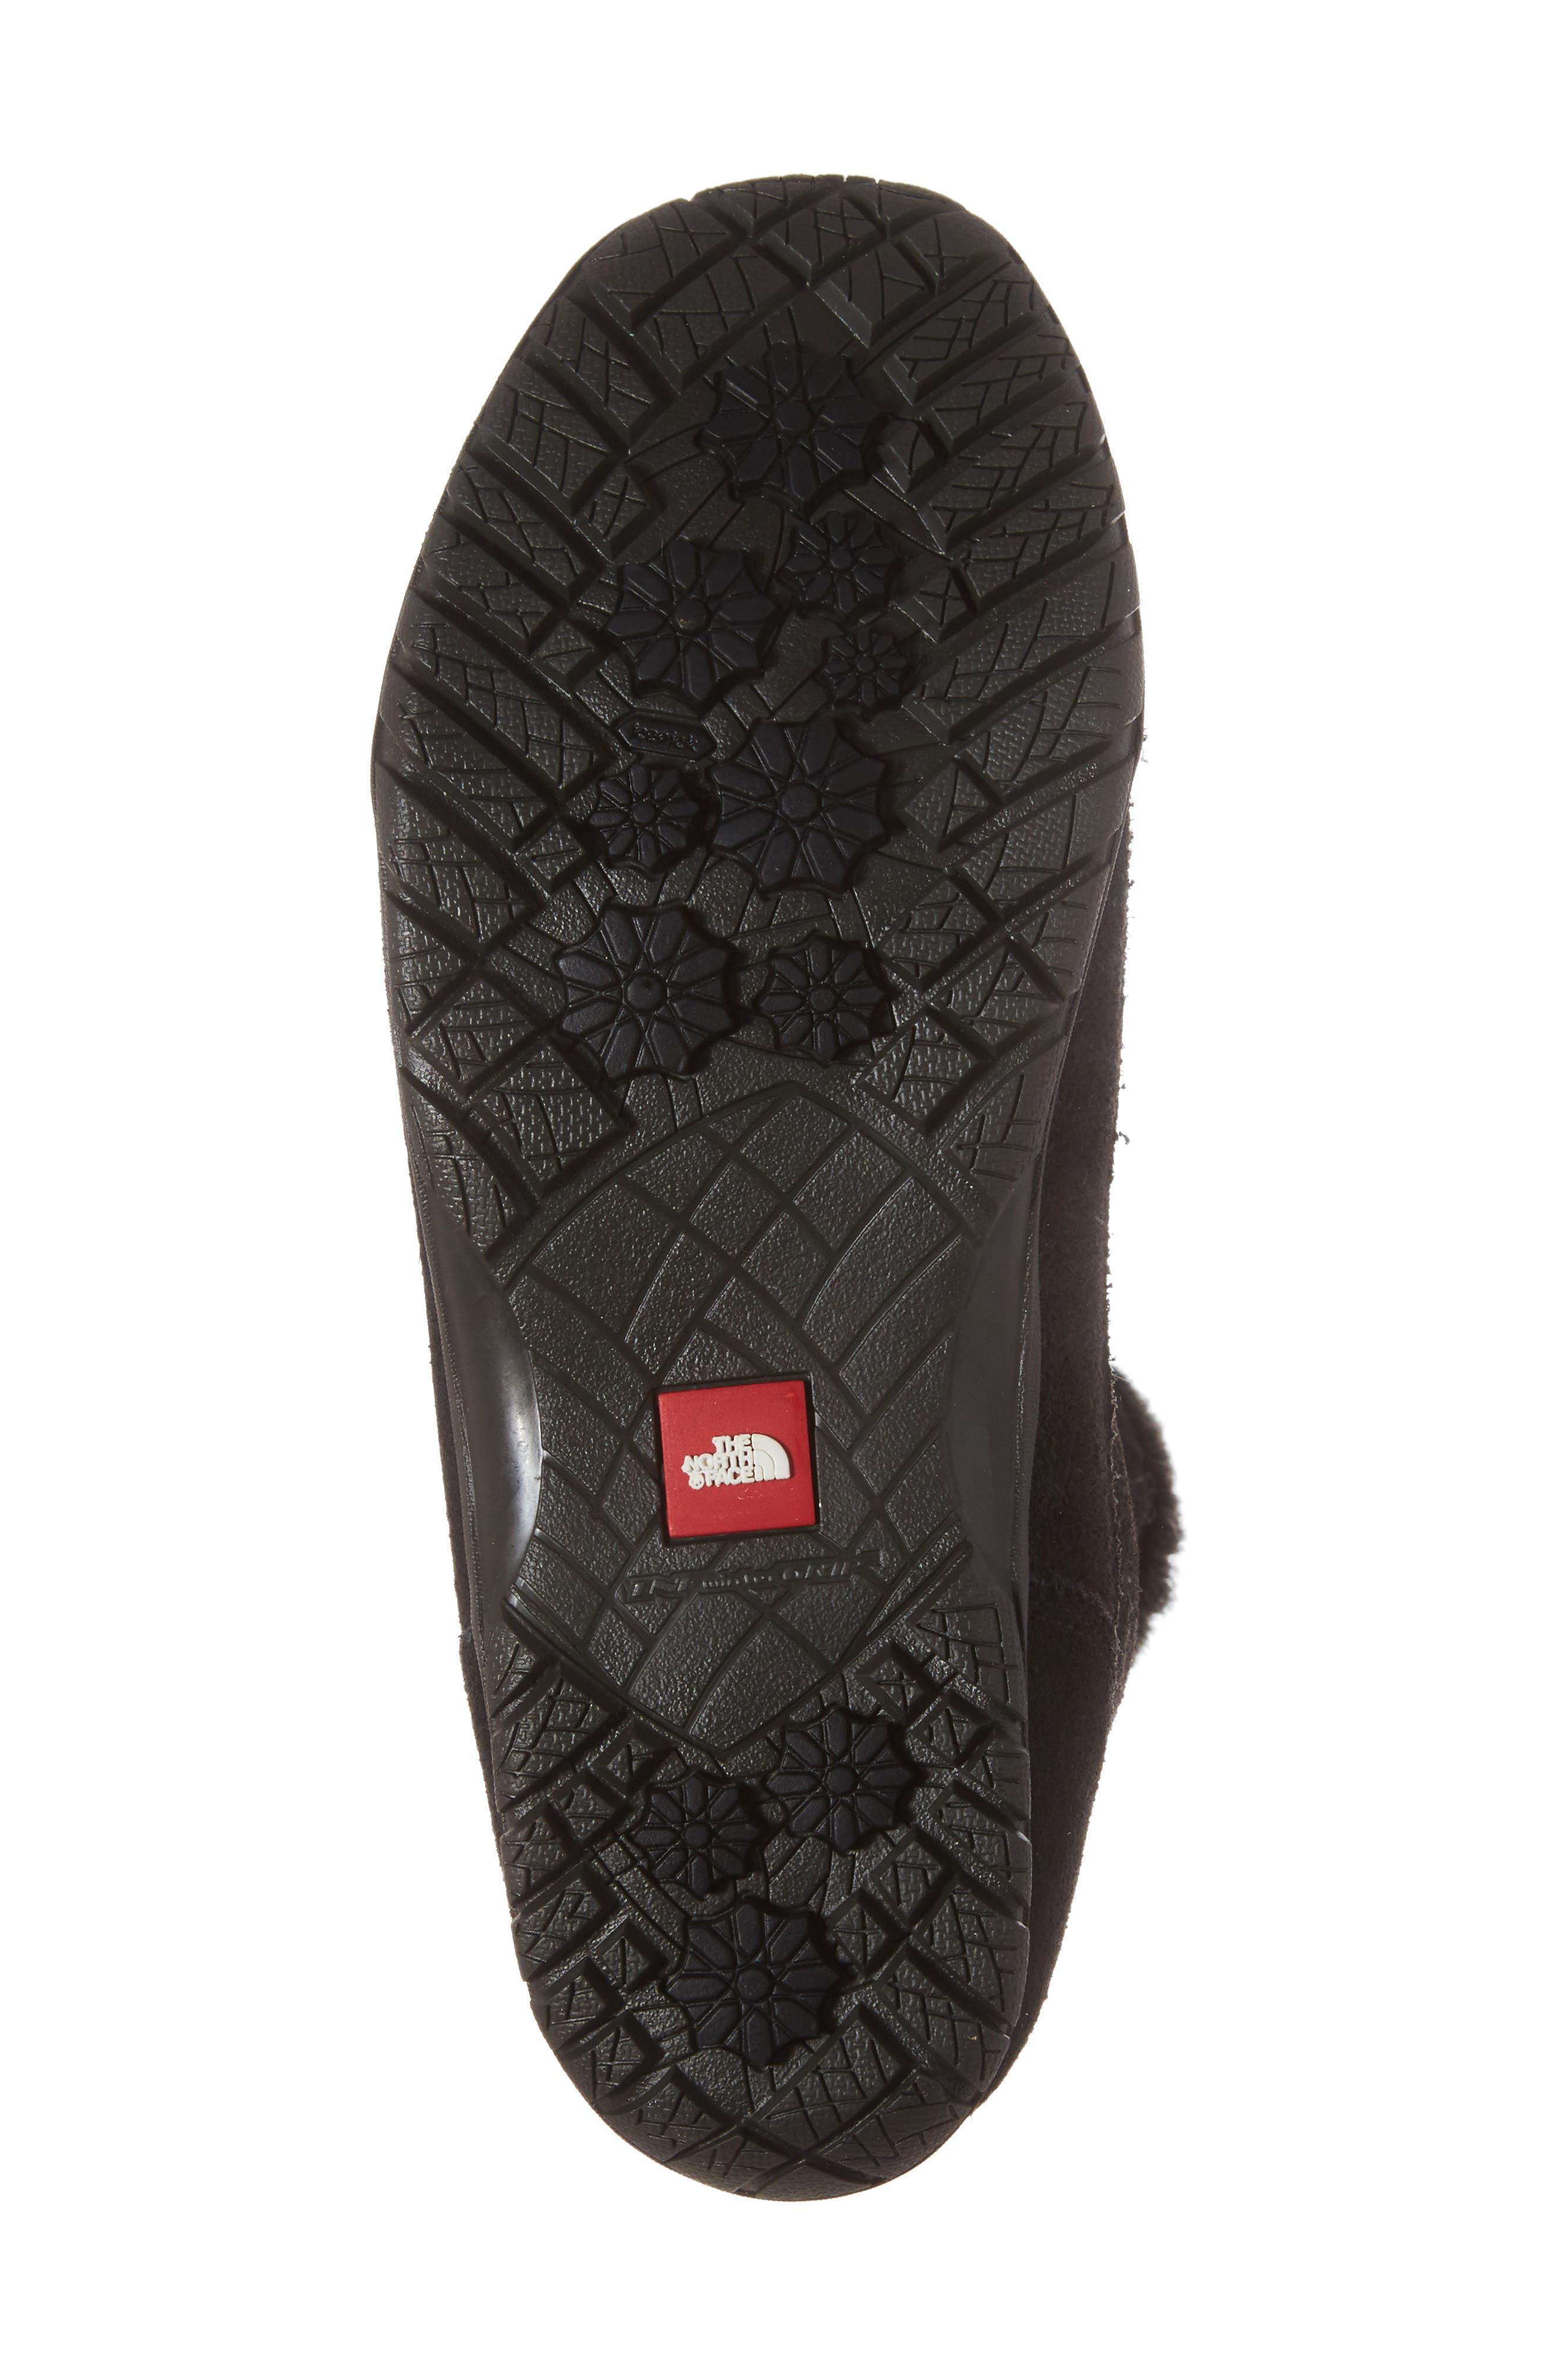 Nuptse Purna II Waterproof PrimaLoft<sup>®</sup> Silver Eco Insulated Winter Boot,                             Alternate thumbnail 6, color,                             Tnf Black/ Beluga Grey